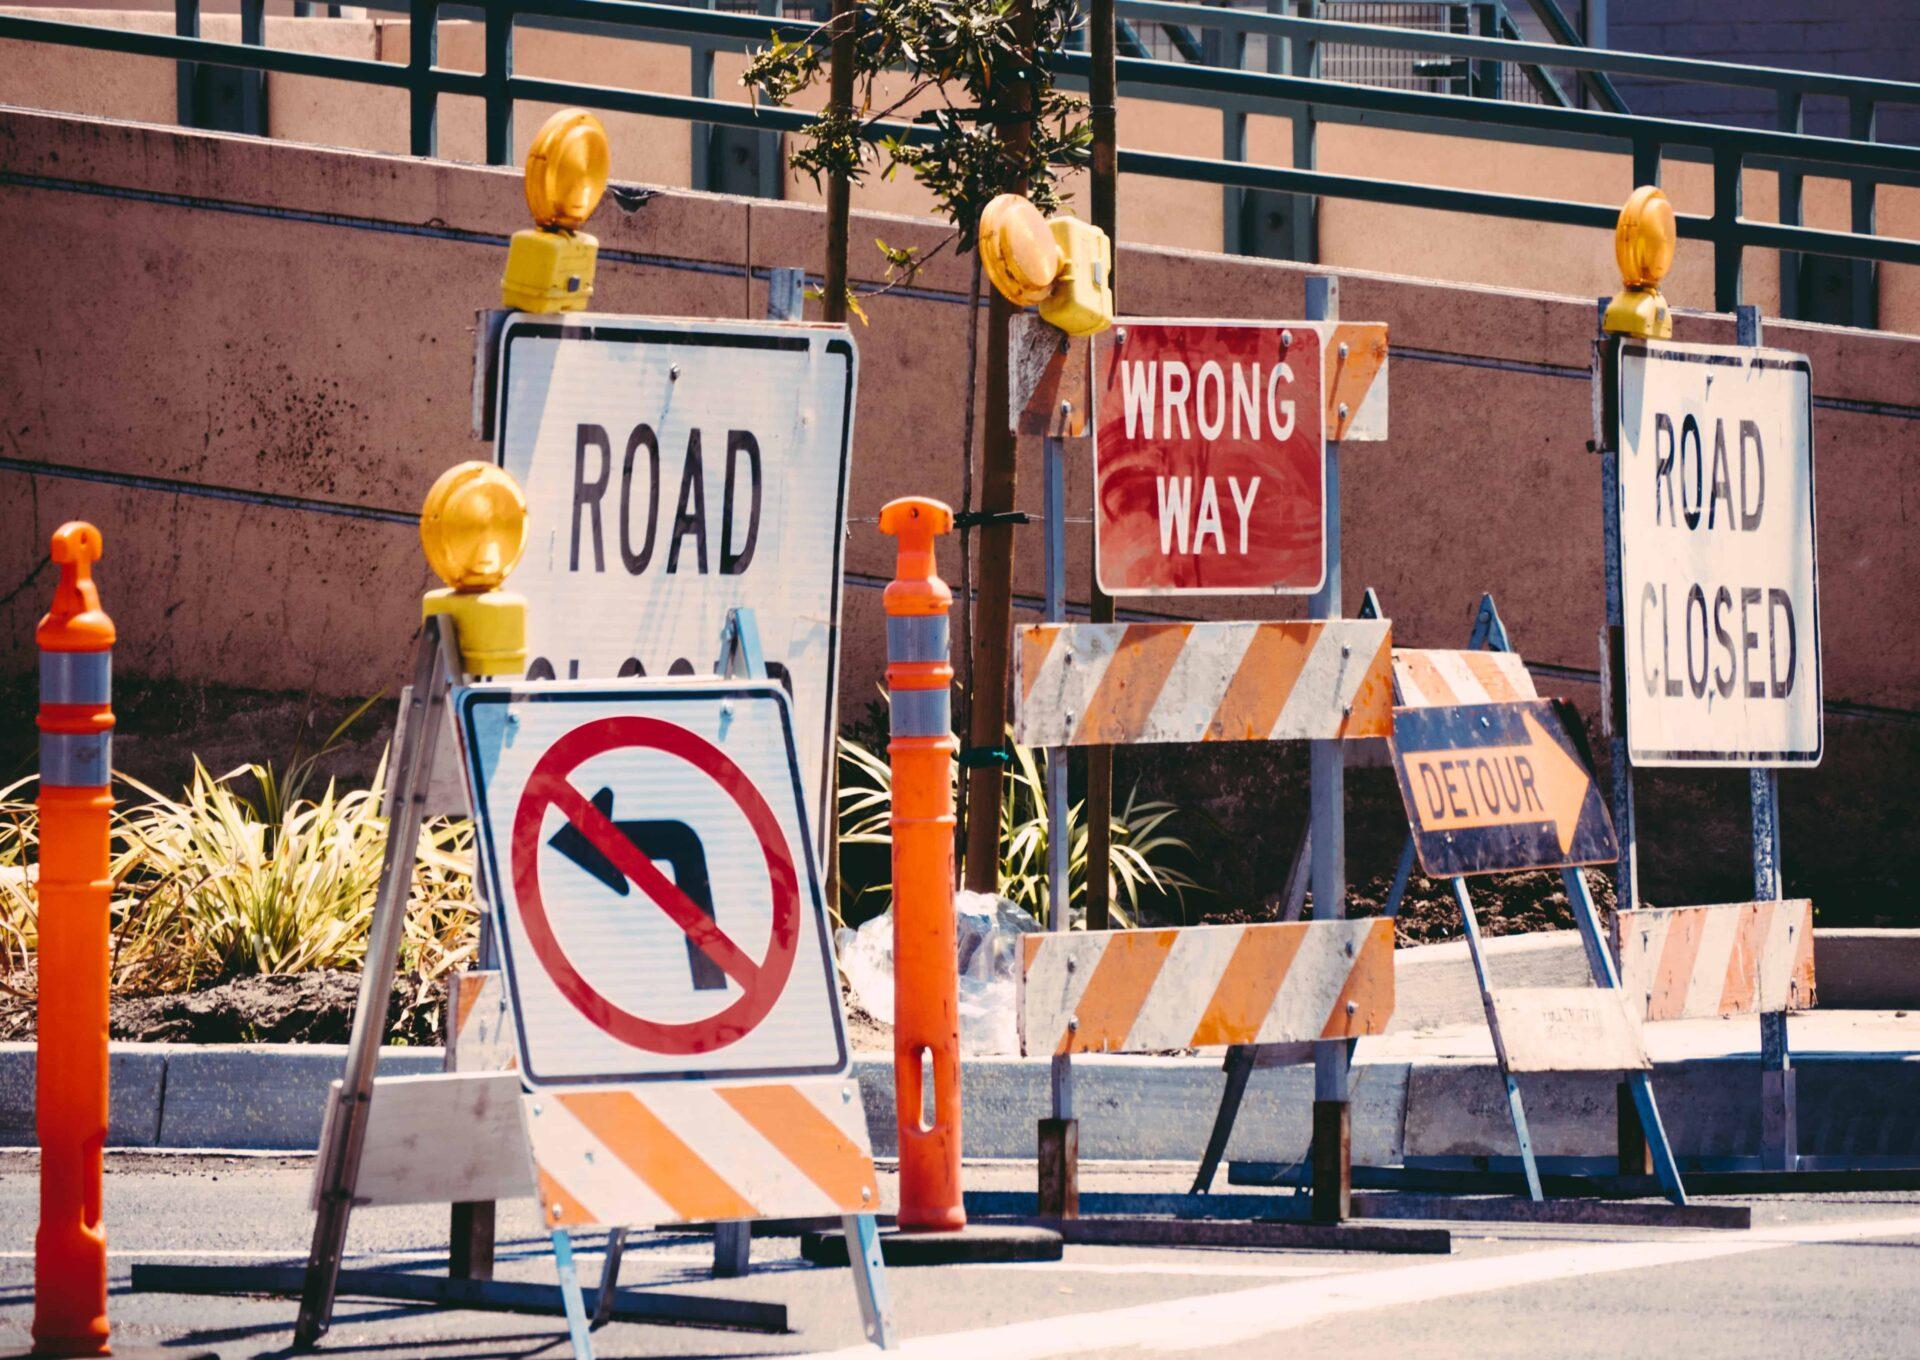 Detour signs representing limiting beliefs